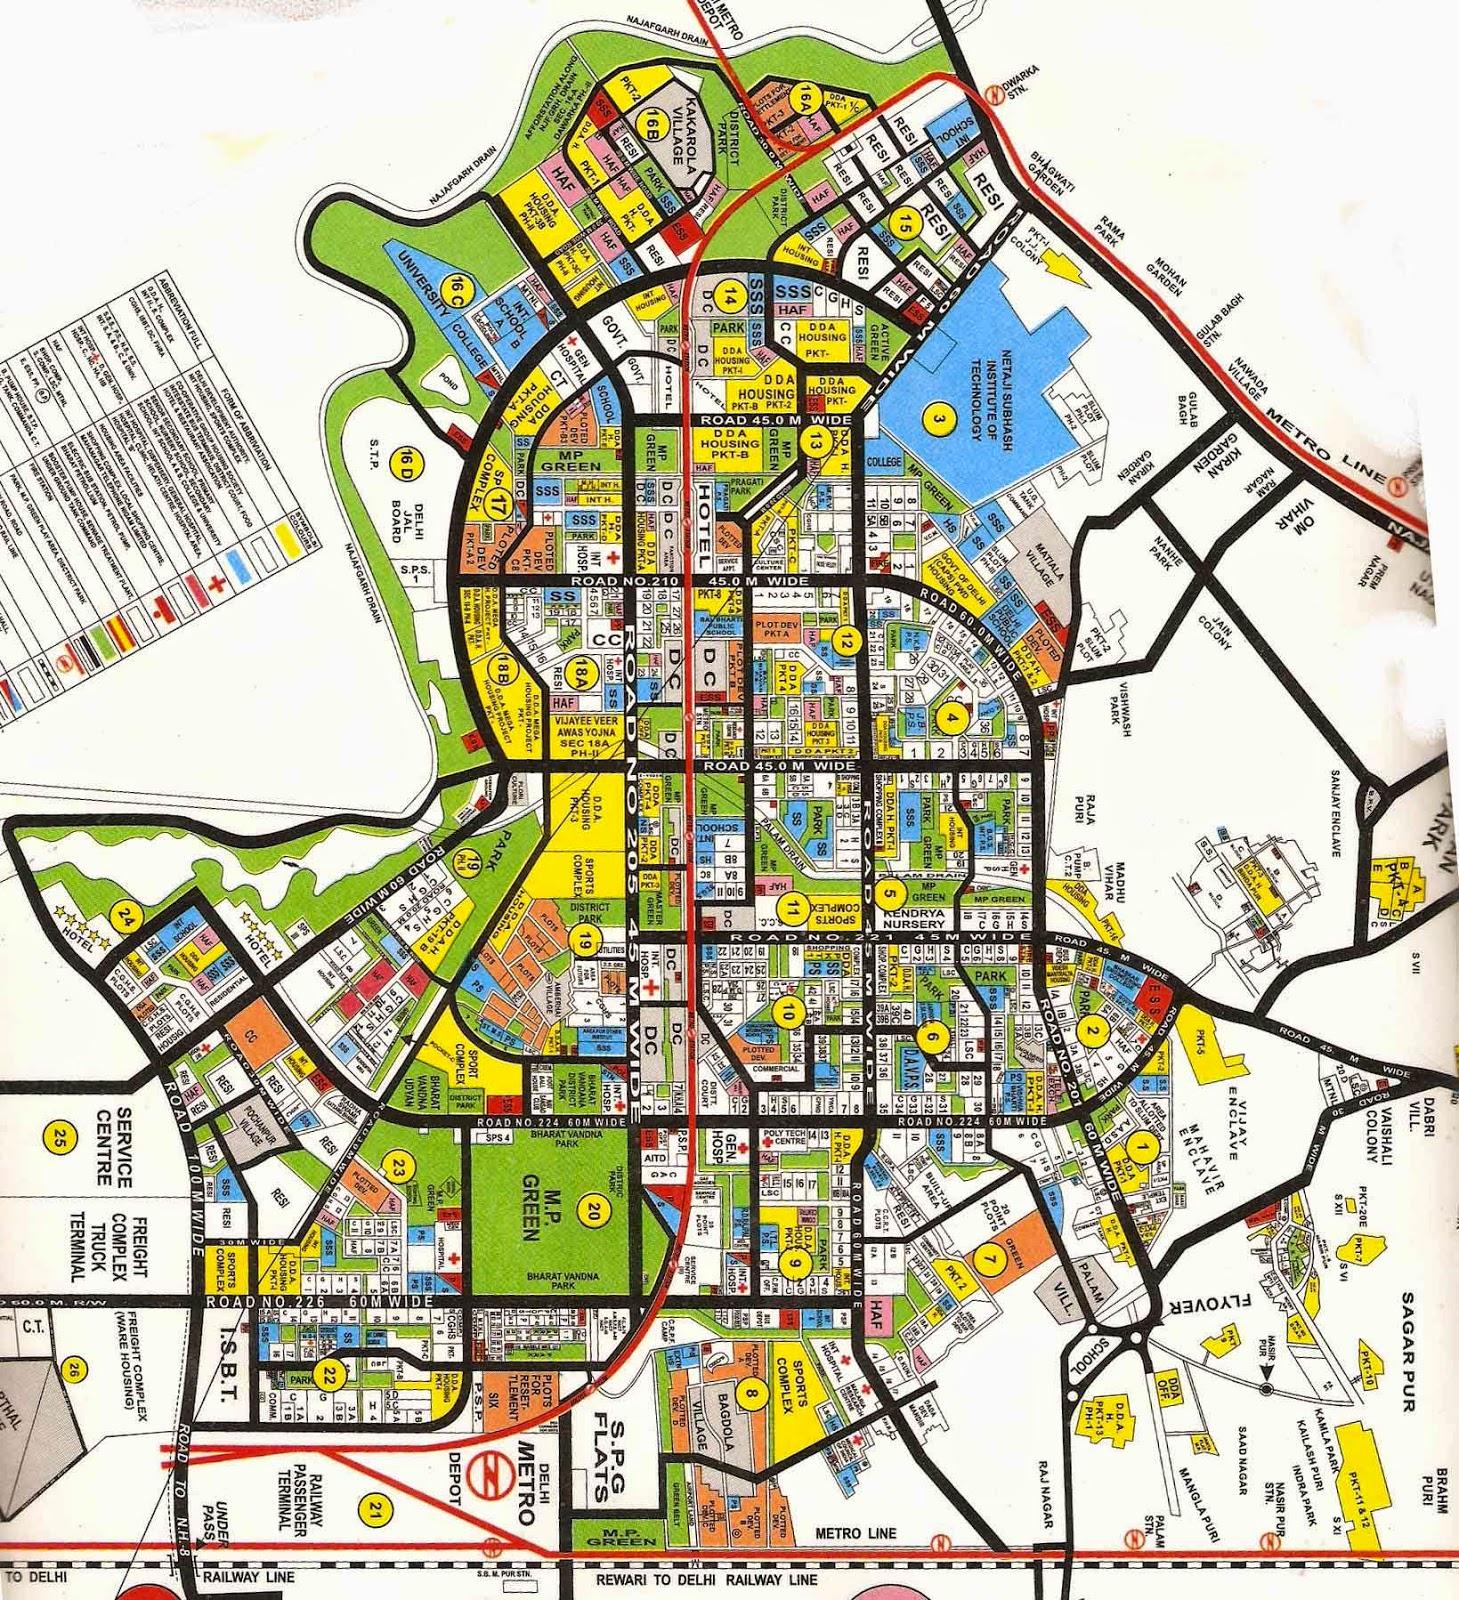 palam airport delhi map Palam Guide Palam Colony Delhi Map palam airport delhi map